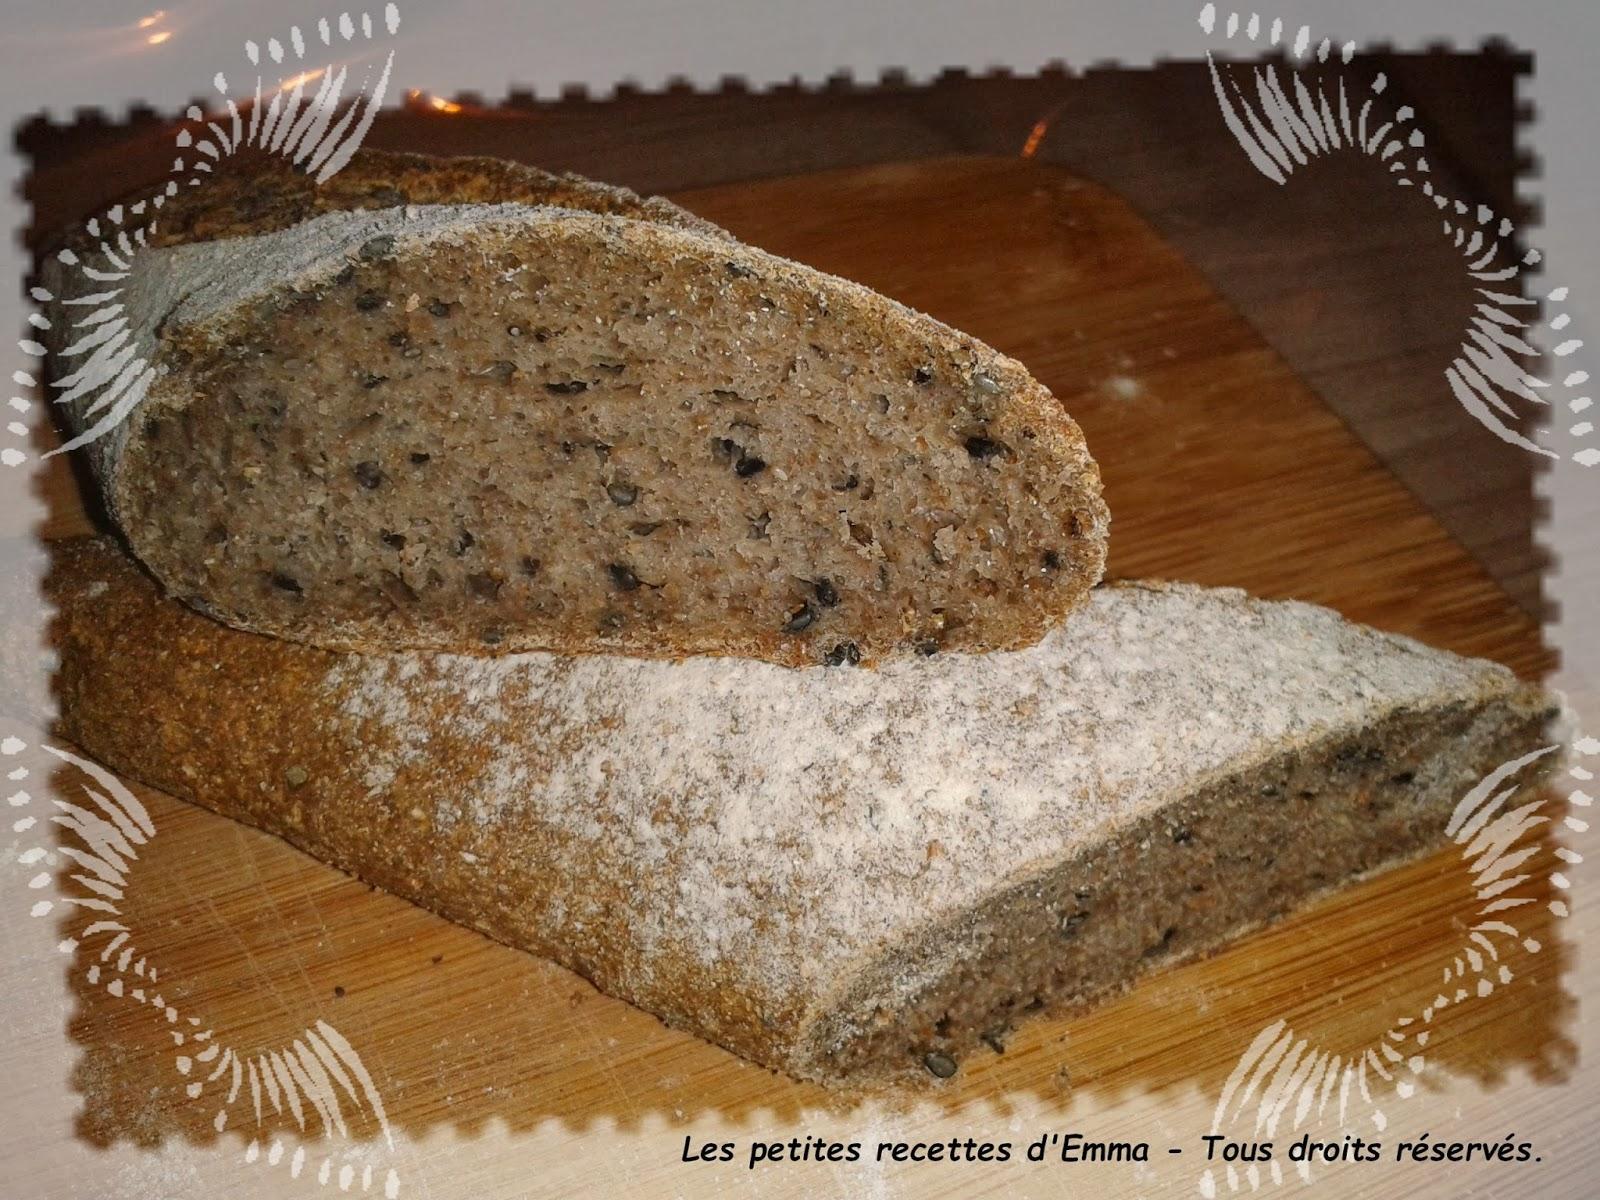 les petites recettes d 39 emma pain la farine int grale. Black Bedroom Furniture Sets. Home Design Ideas